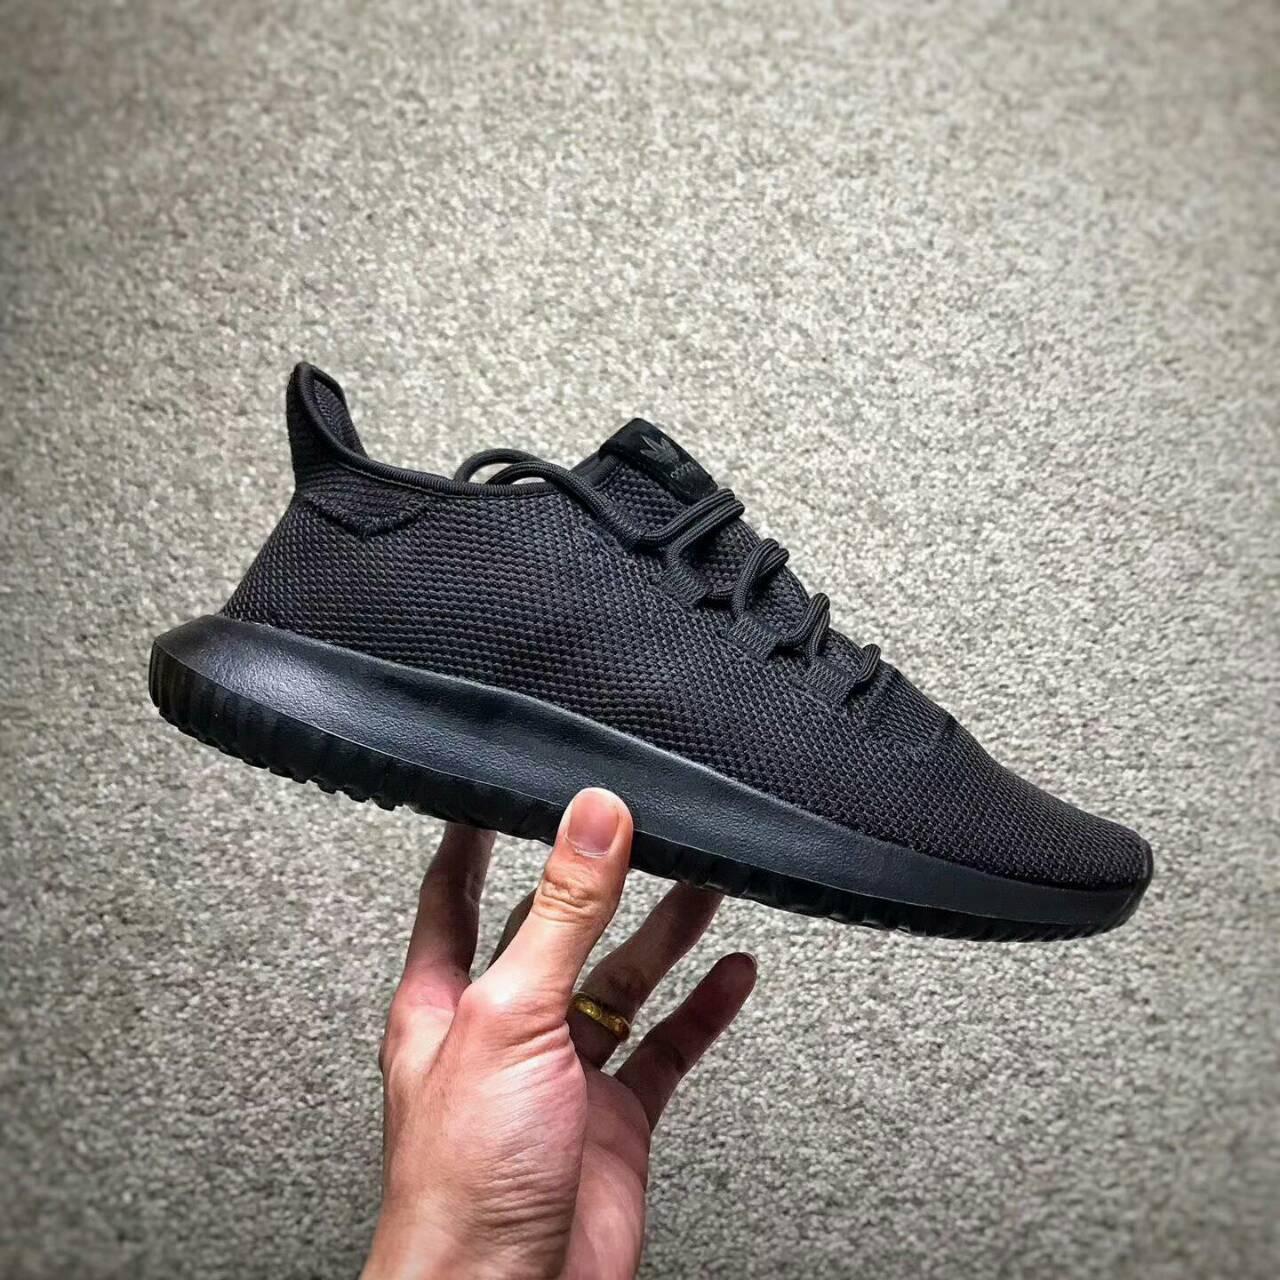 Adidas original Tubalar Shadow 簡版小椰子 純黑編織 情侶款。運動,戶外與休閒人氣店家Mansmall 運動休閒館的ADIDAS、Tubalar有最棒的商品。快到日本NO